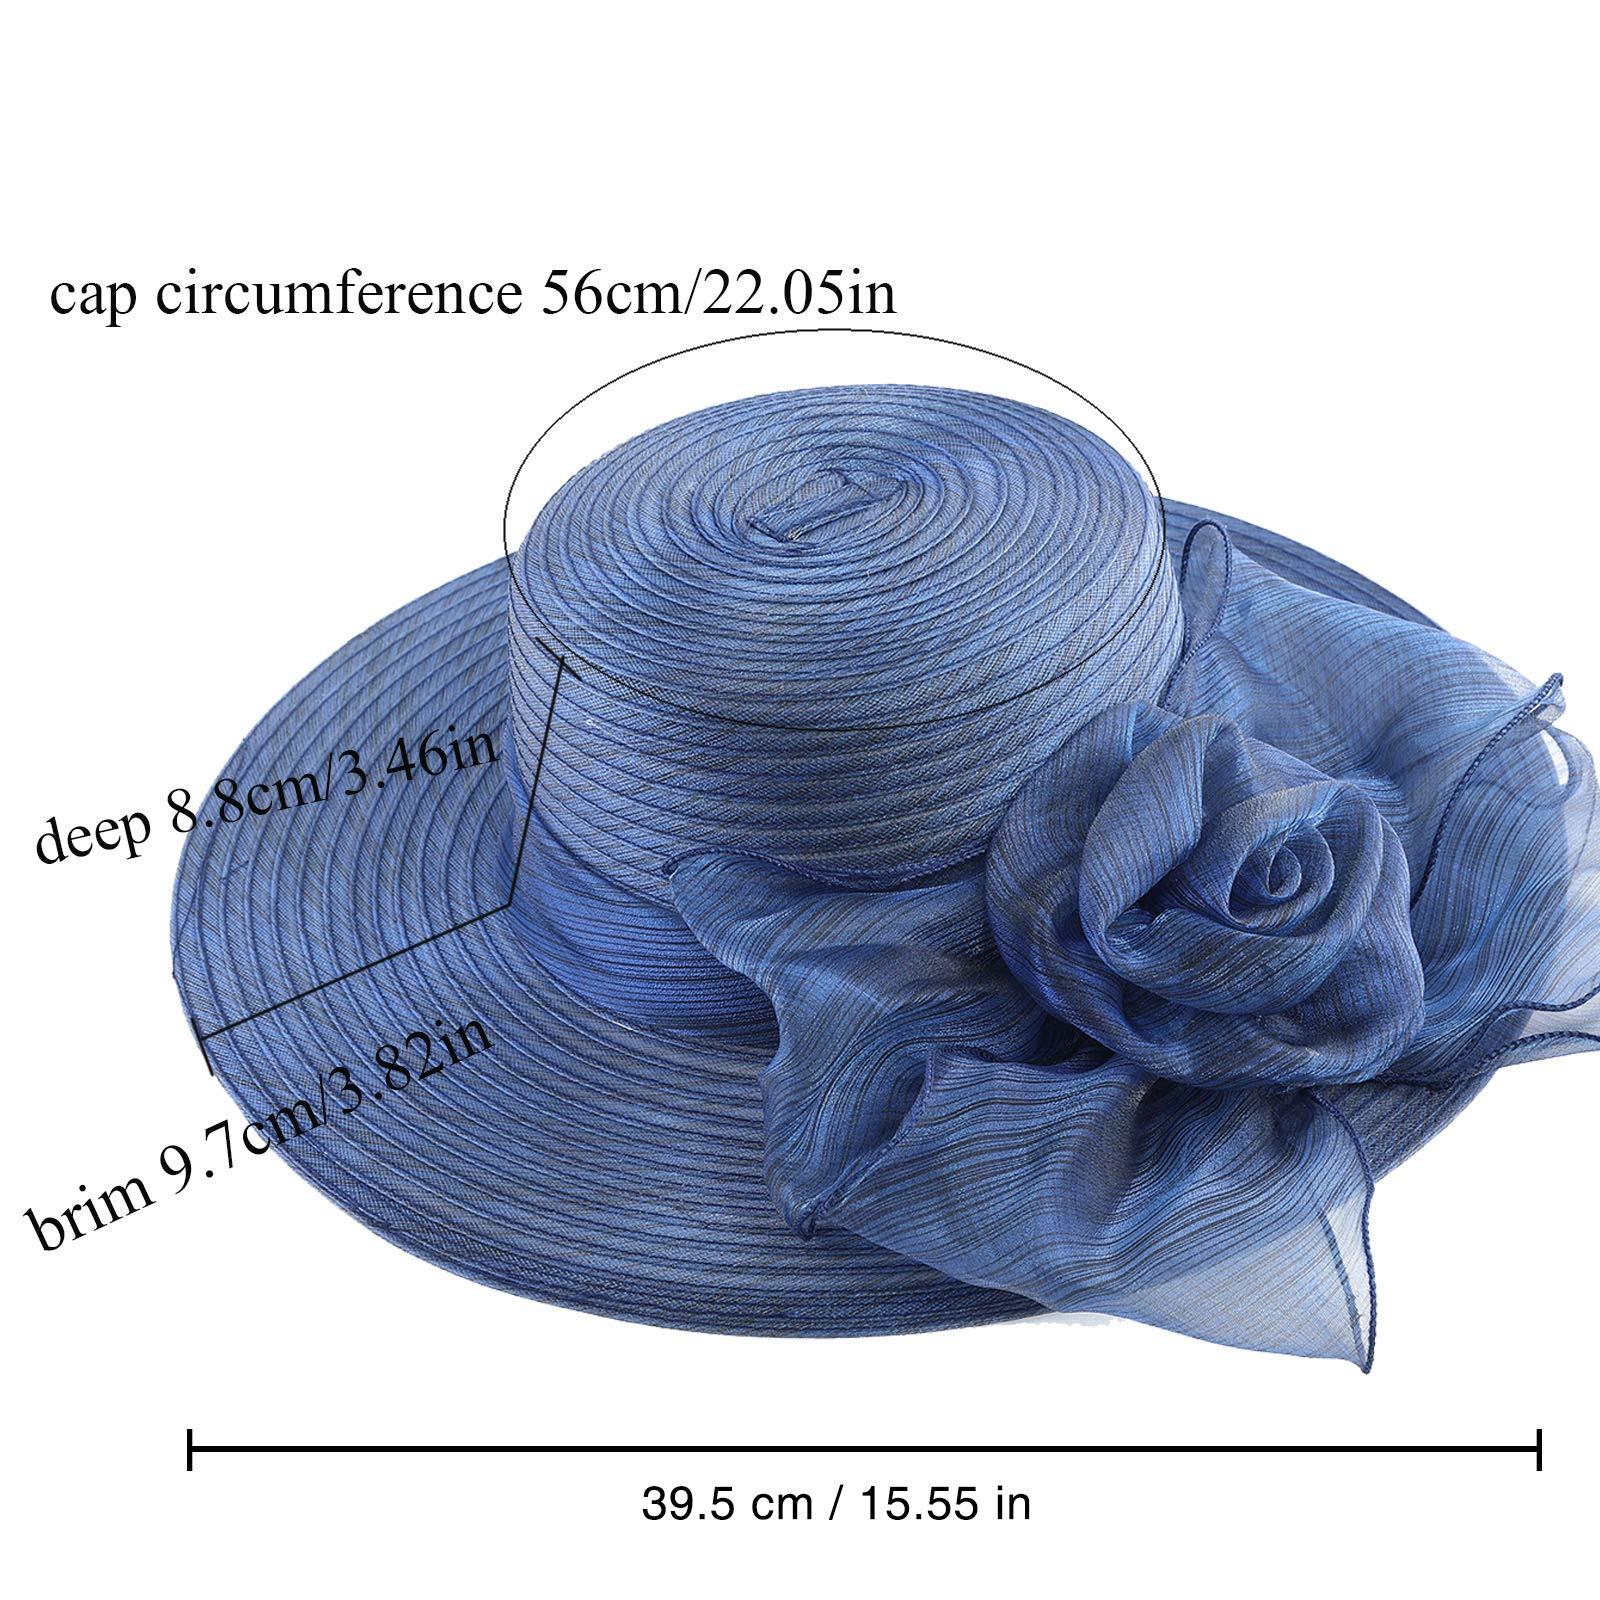 WELROG Women's Derby Church Dress Hat - Wide Brim Floppy Floral Ribbon UPF Protection Wedding Sun Hats(Navy Blue) by WELROG (Image #5)